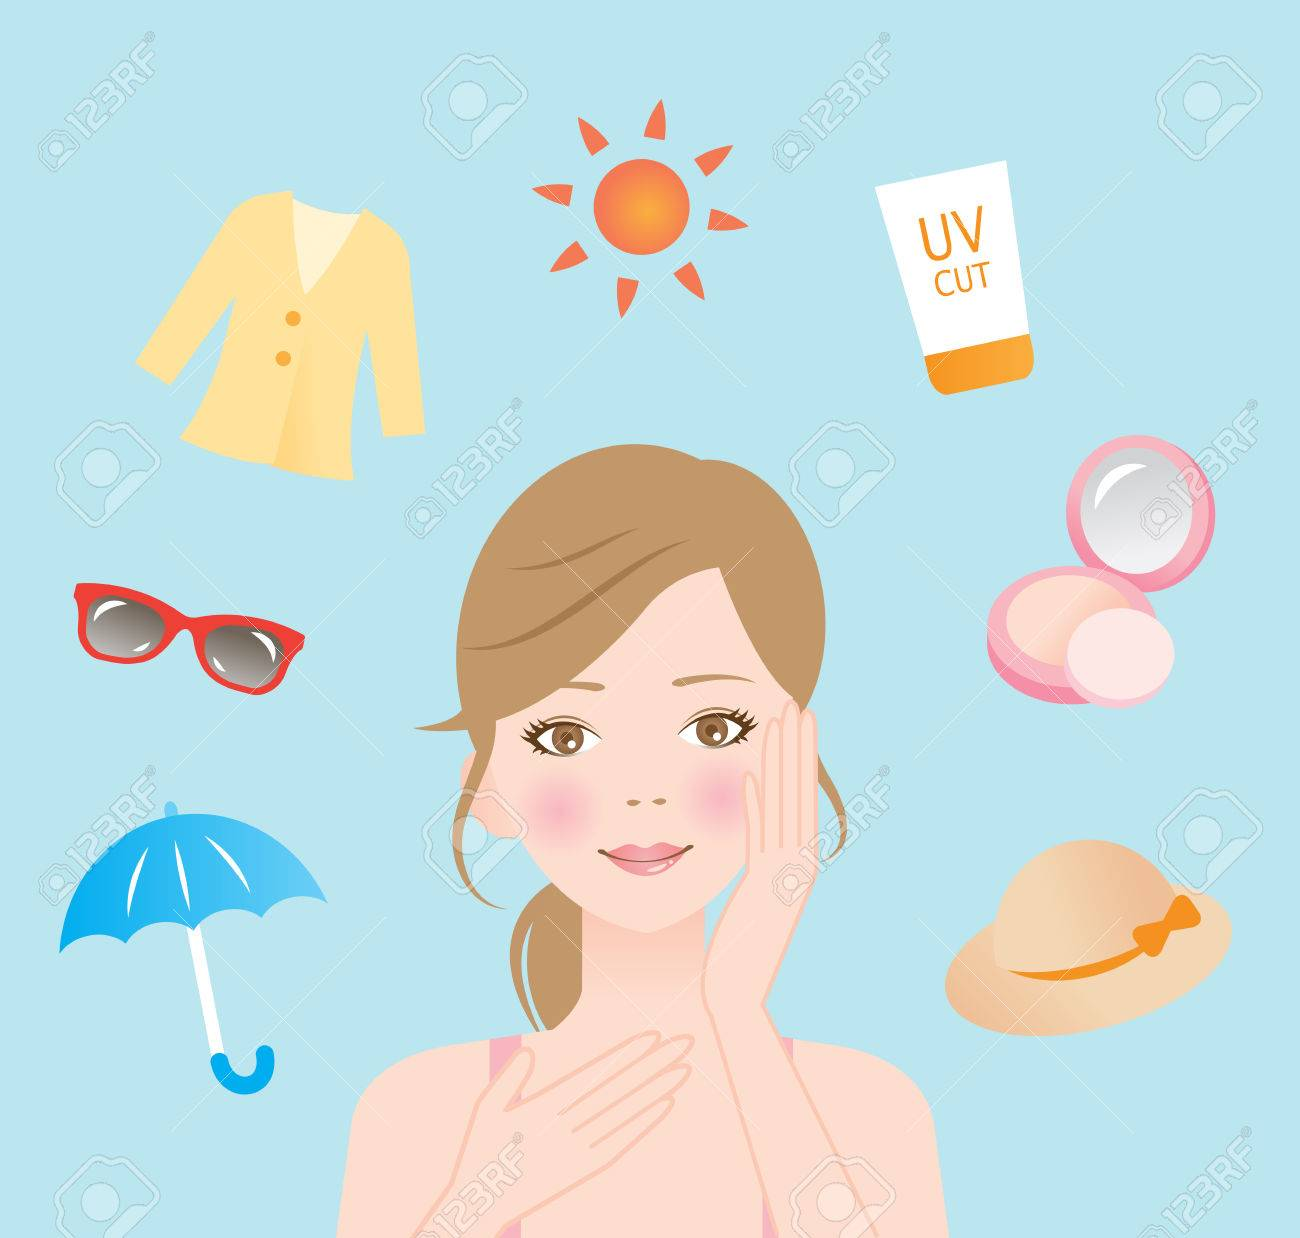 UV protection - 59920824